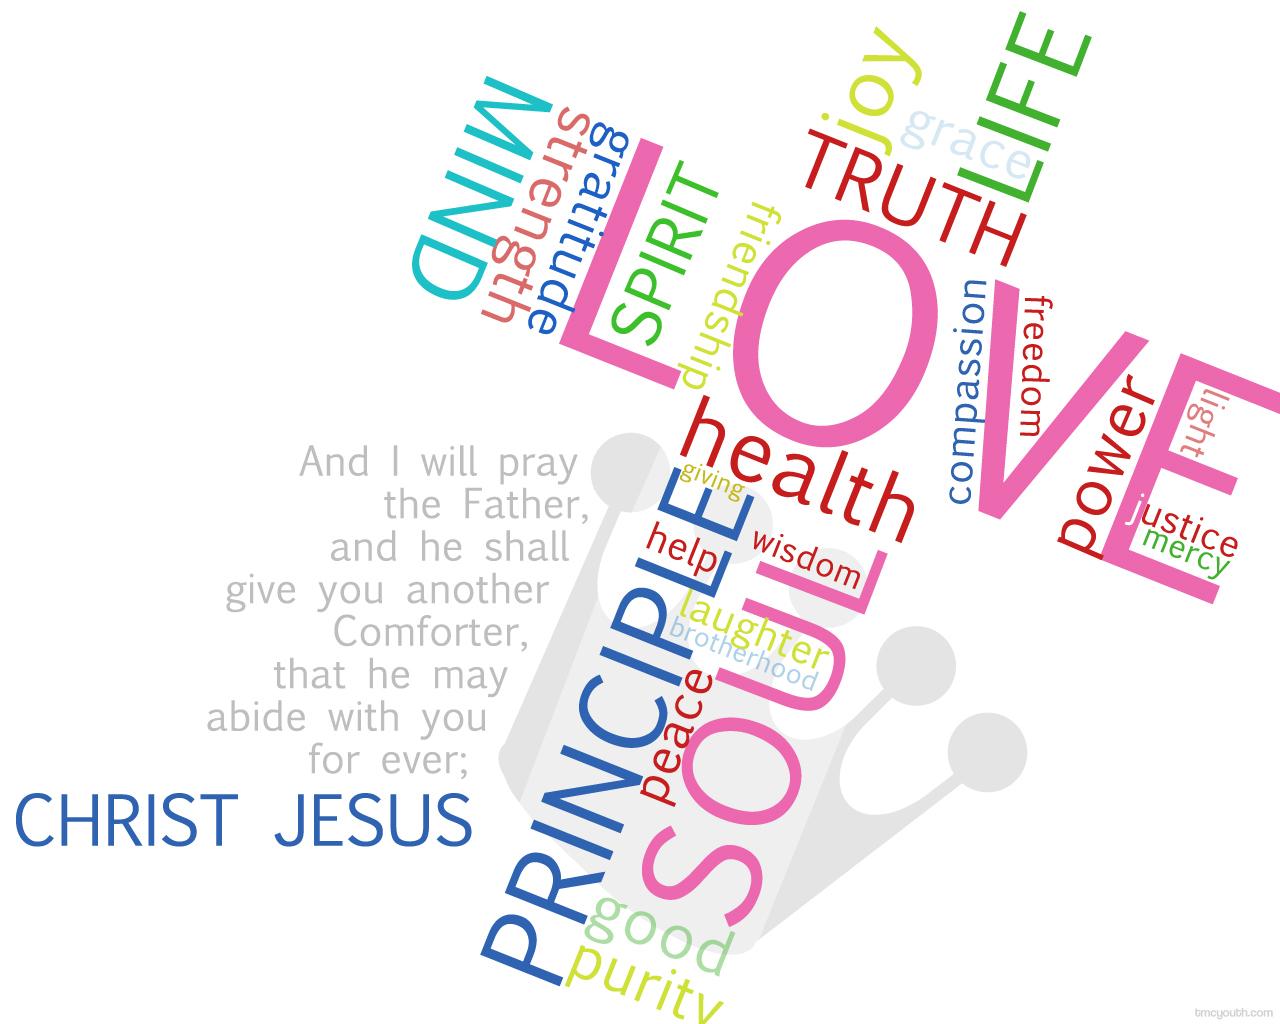 Christian Quotes About Jesus httpwallpaper4godcomenbackground 1280x1024